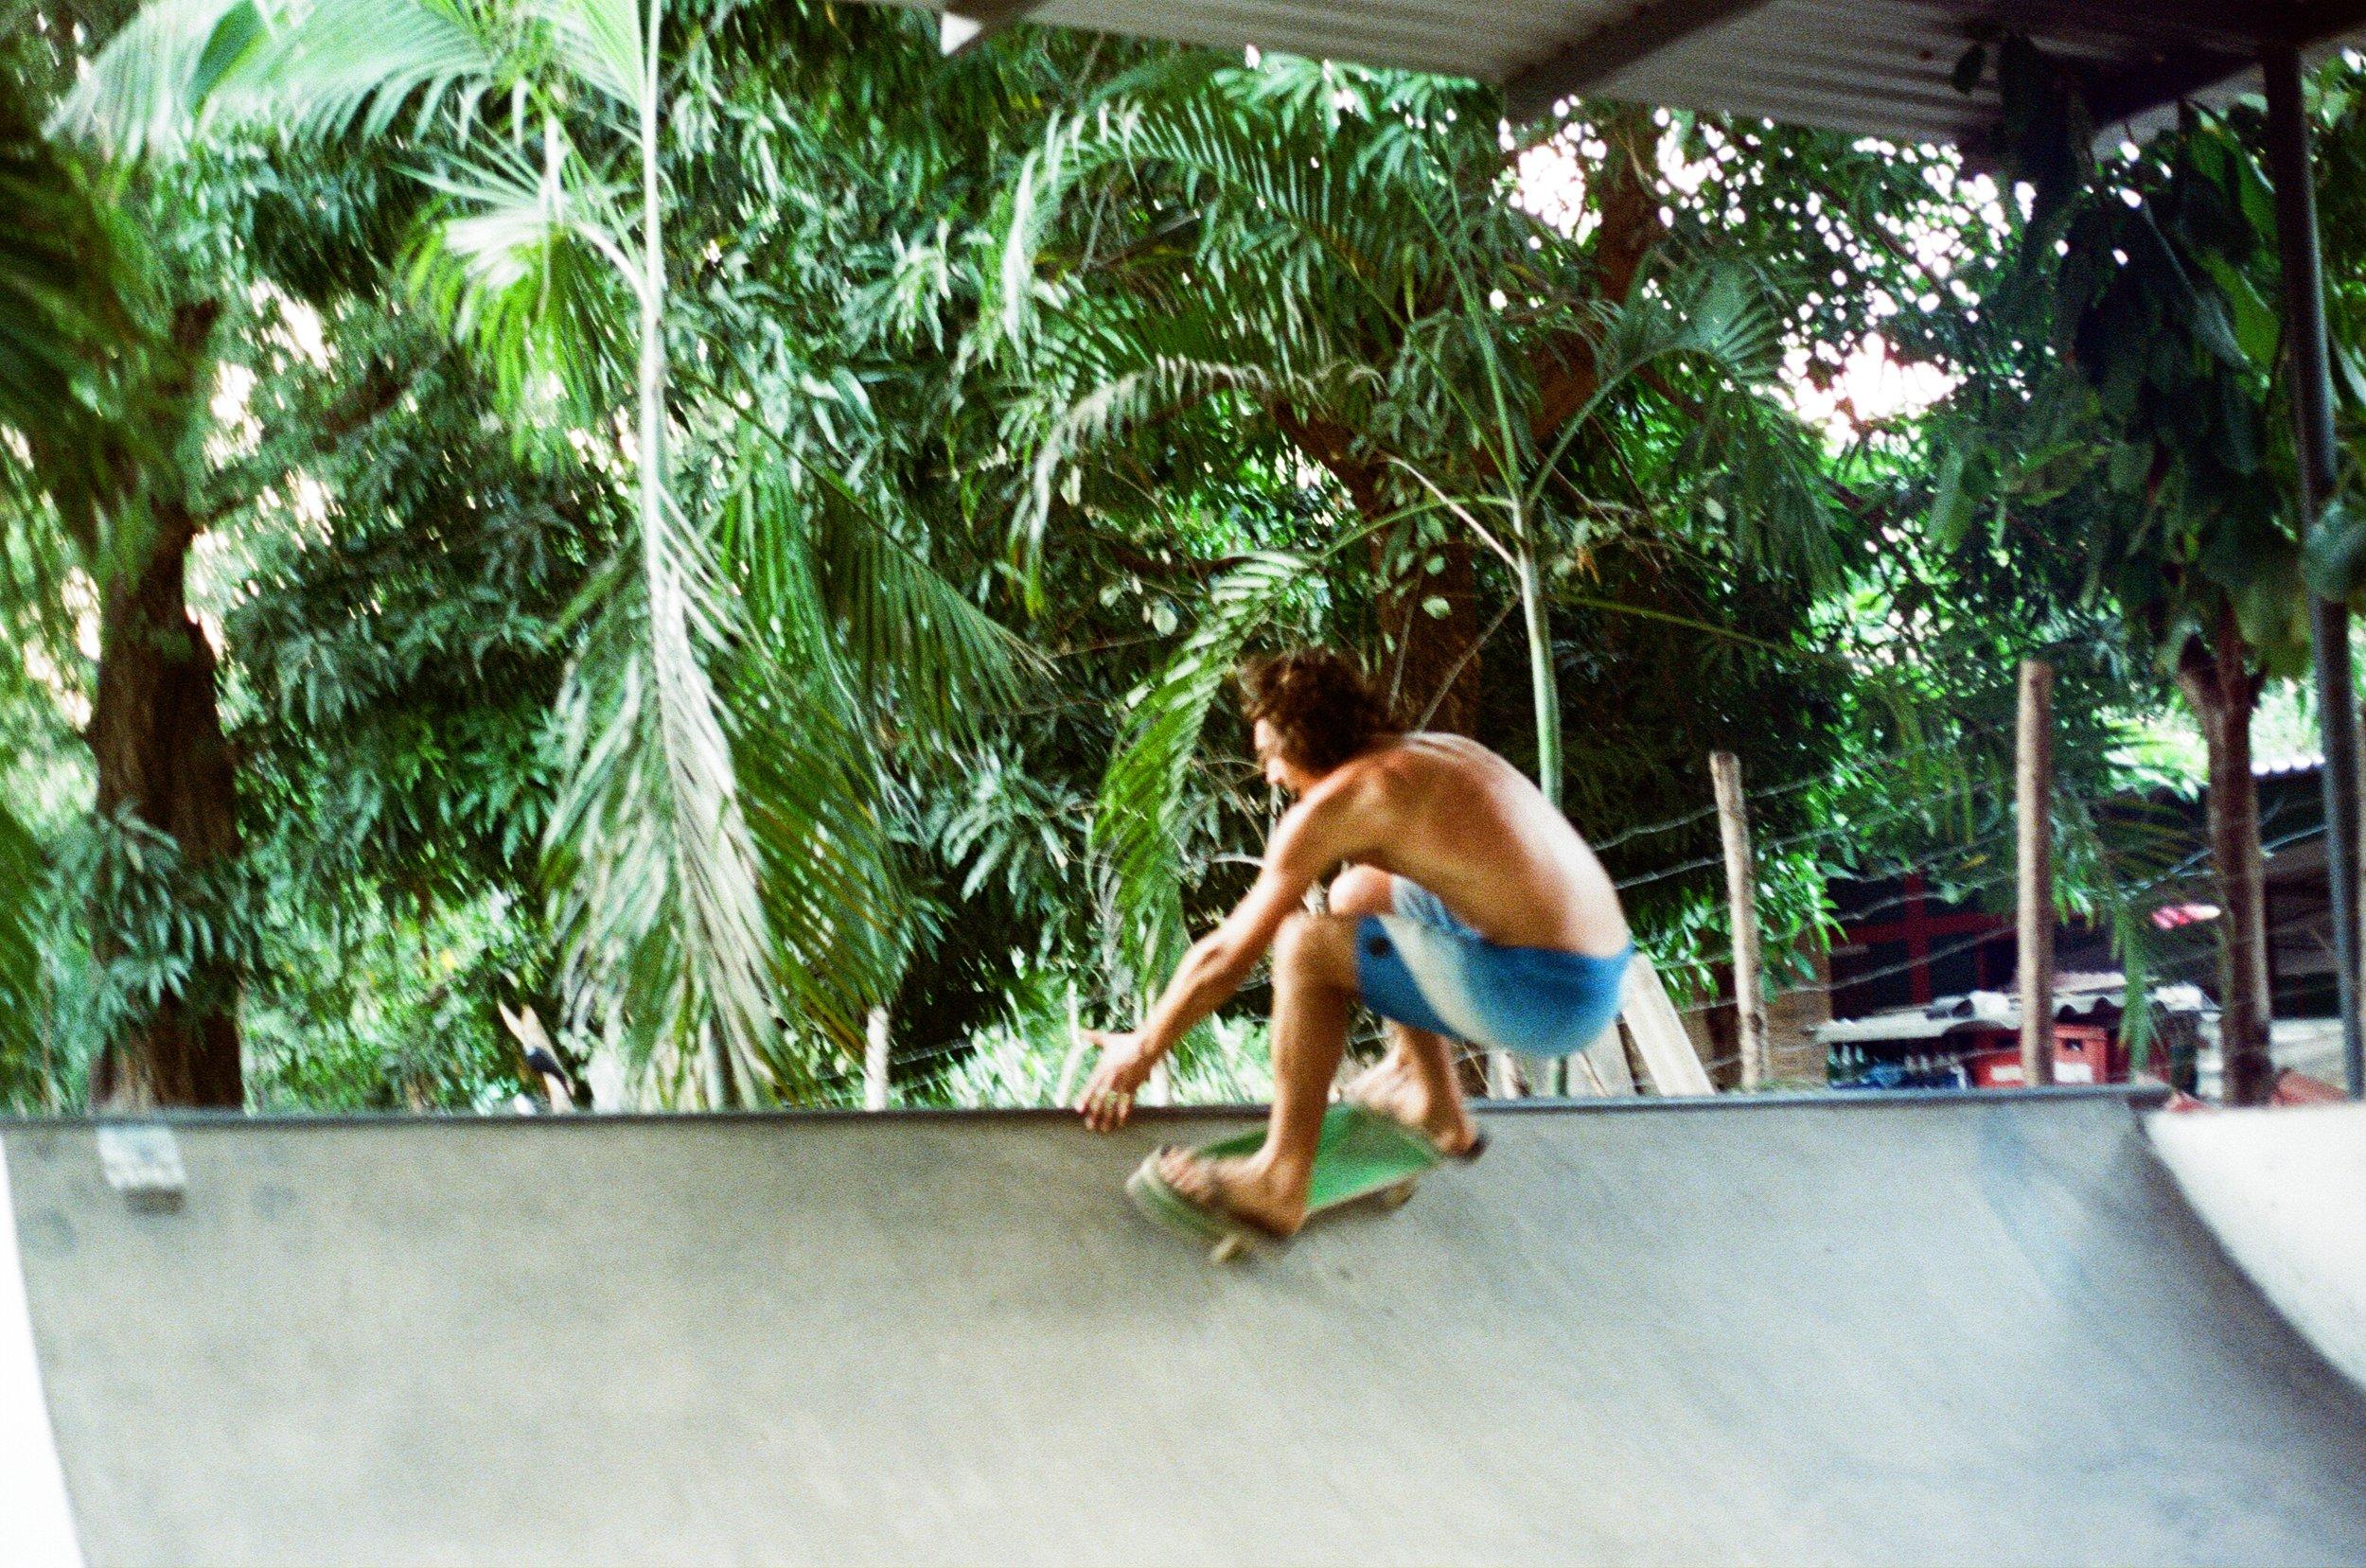 Concrete Surfing